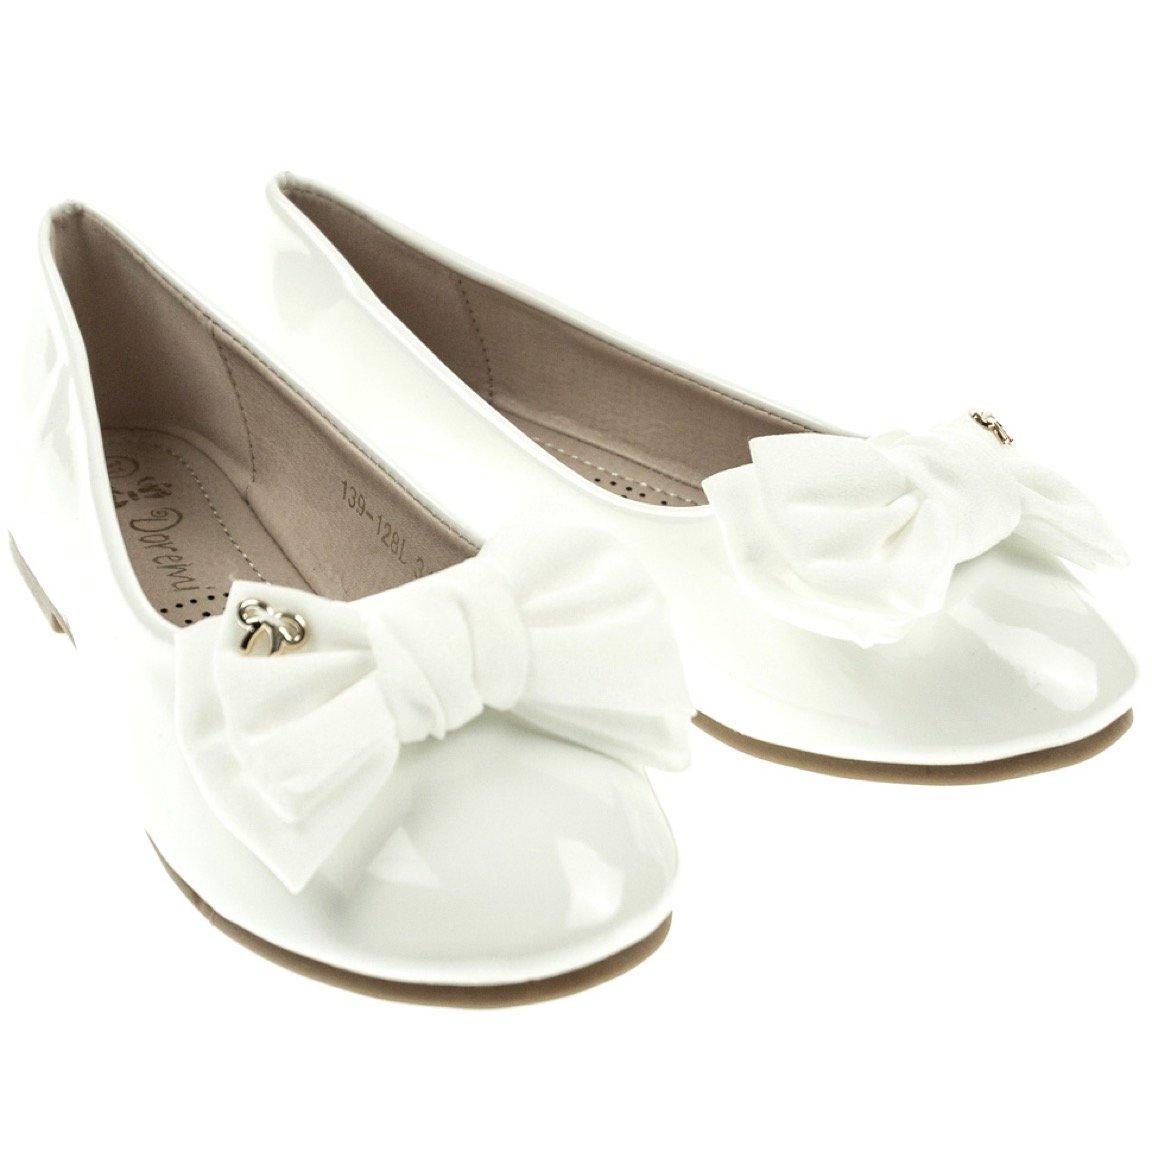 Doremi παιδικά αμπιγιέ παπούτσια «Ballerina»